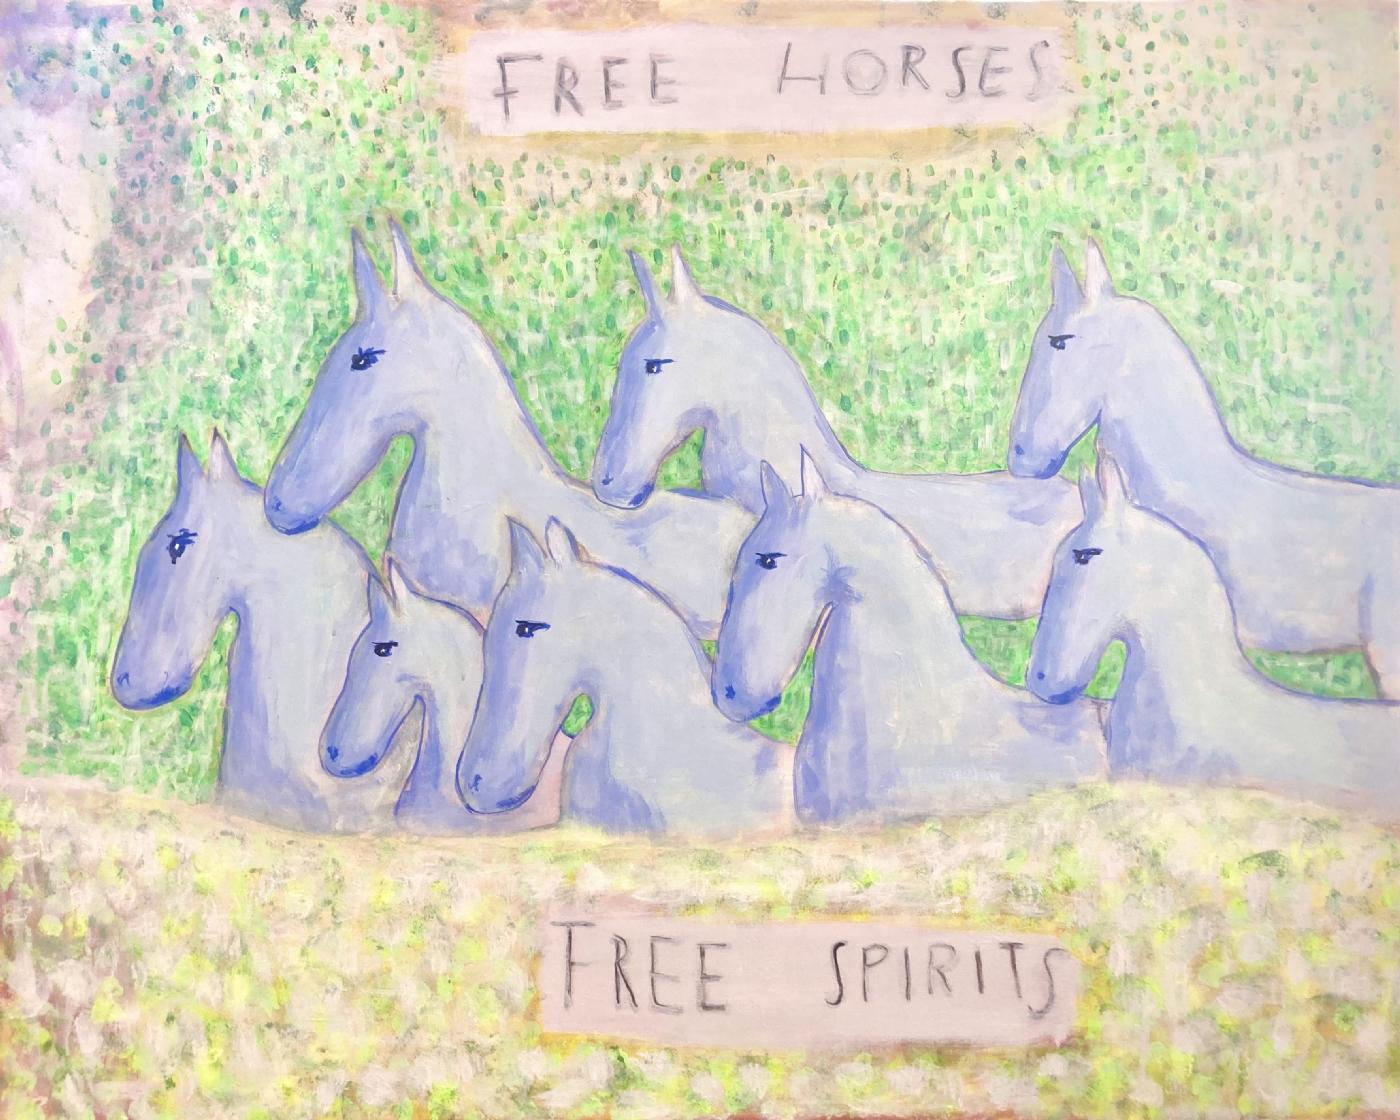 Free Horses - Free Spirits | Maleri